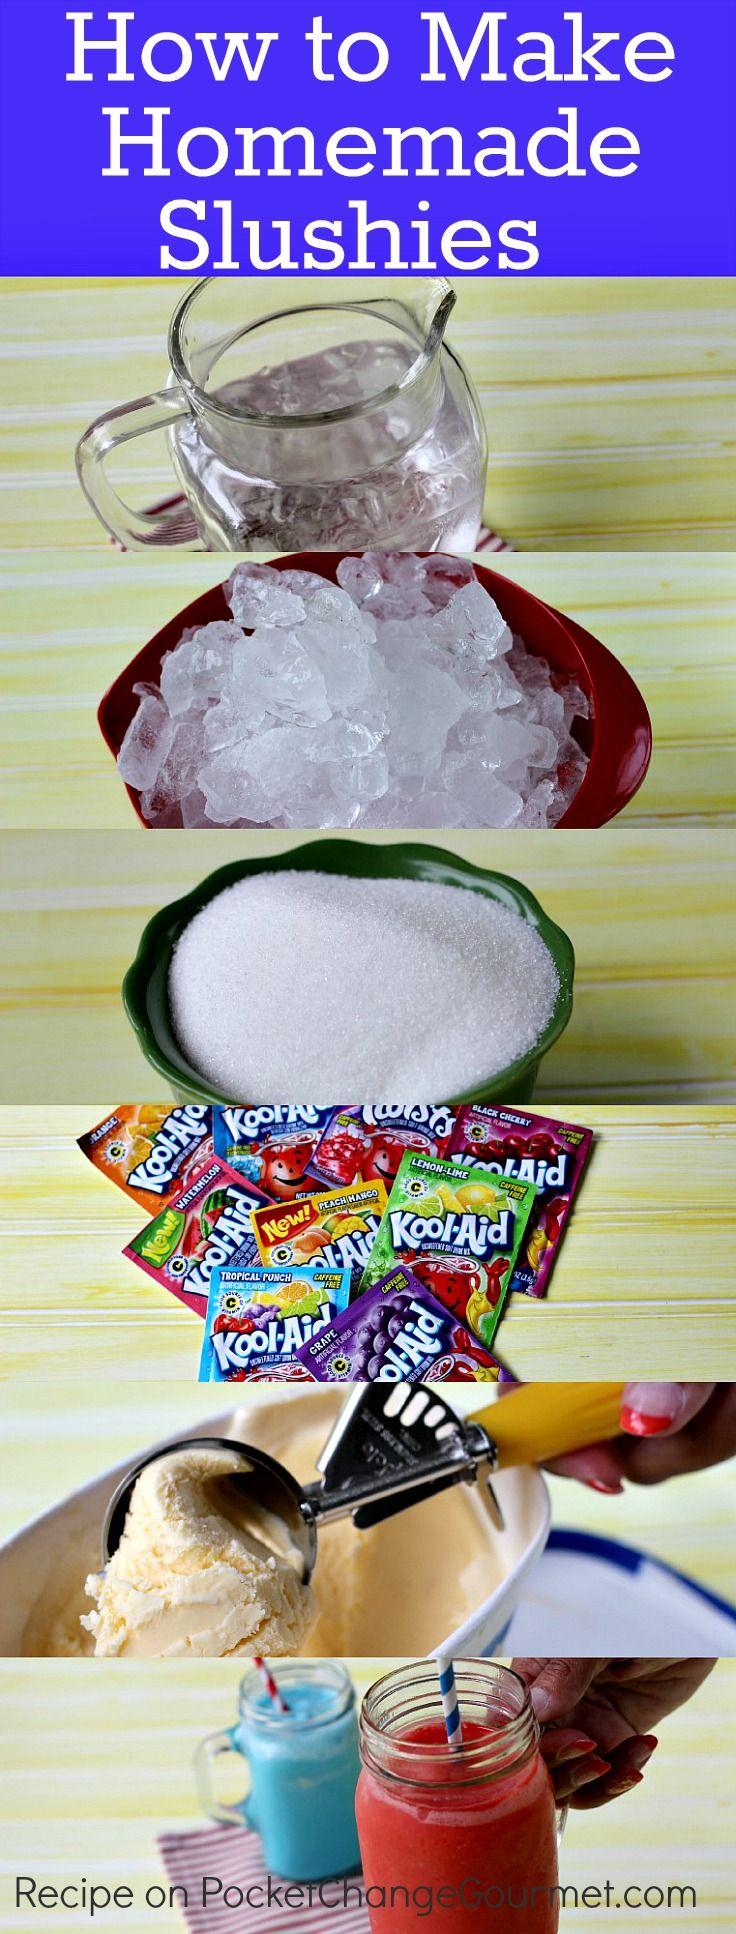 Homemade Slushies with icecream!!